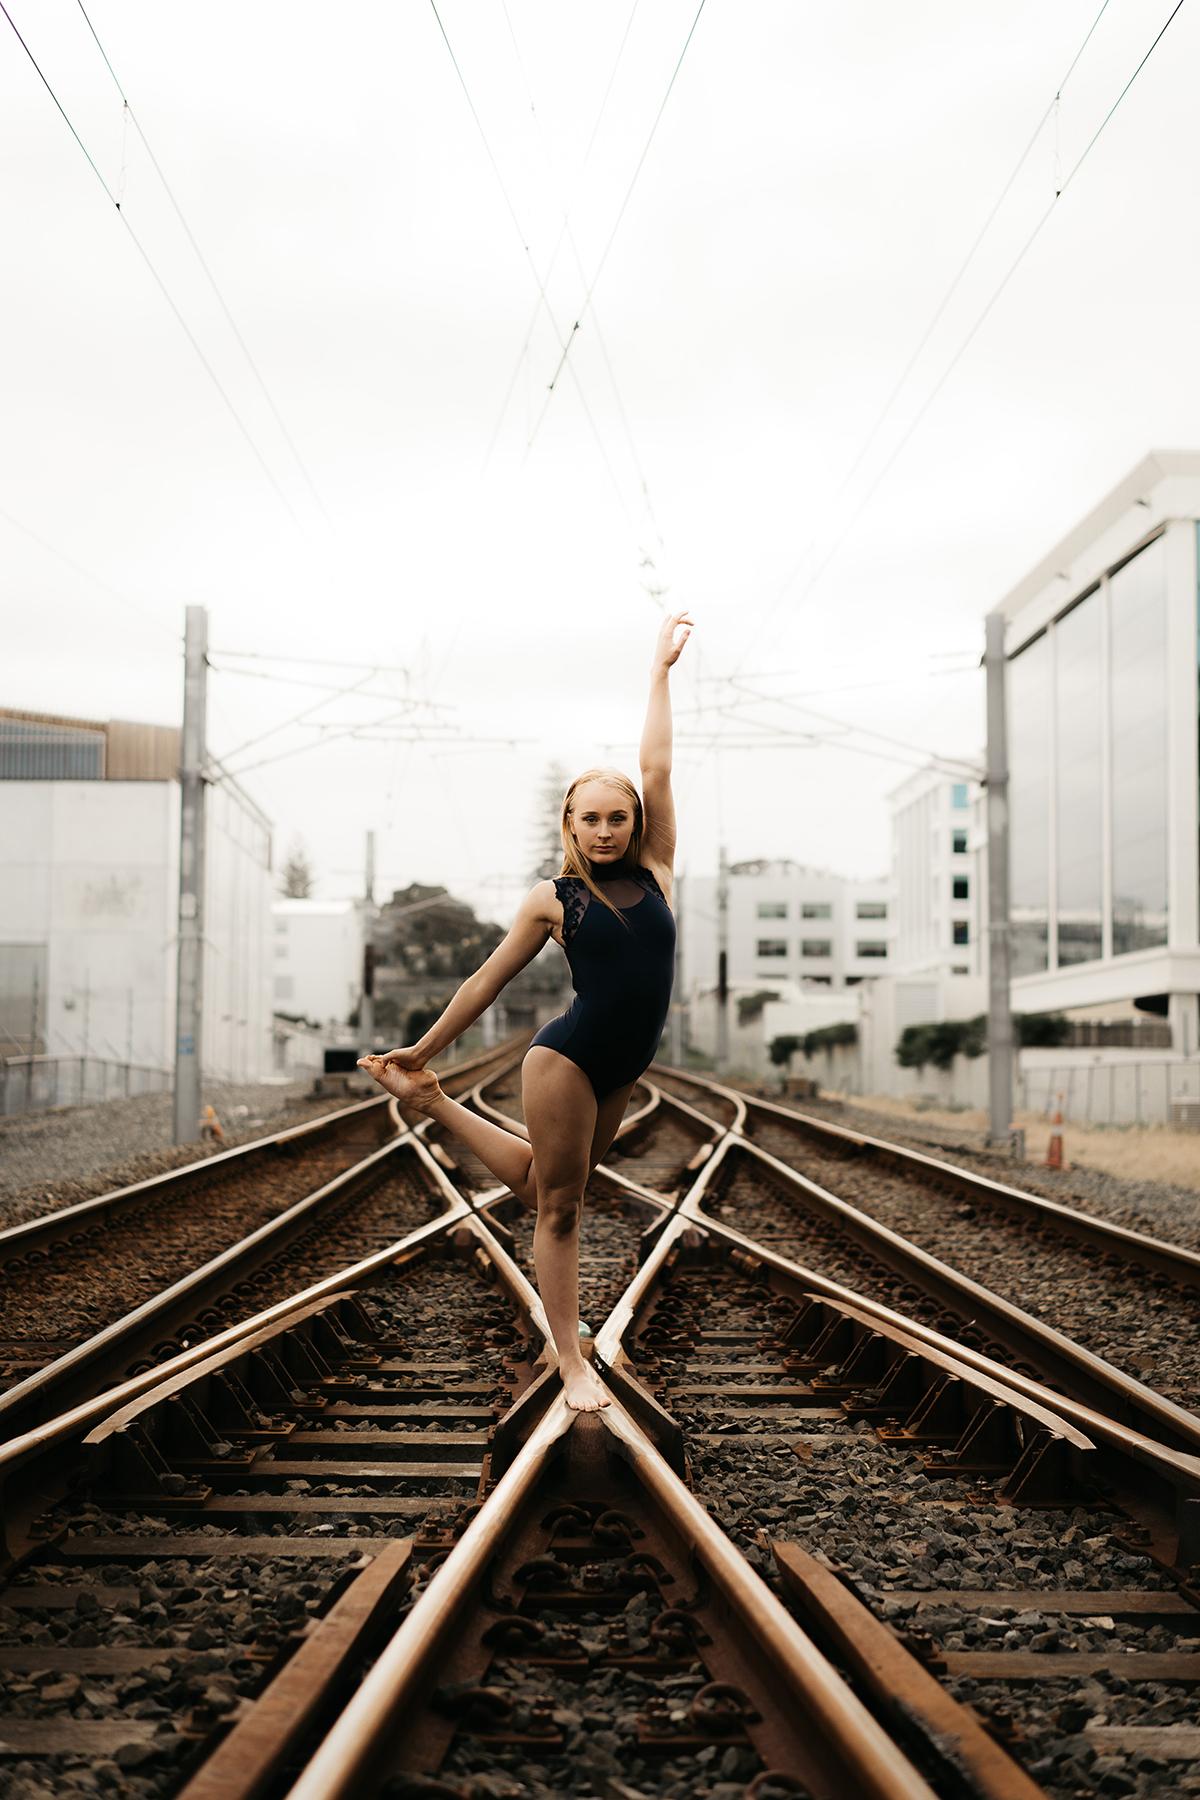 Keelia_Kennychickphotos-64.jpg